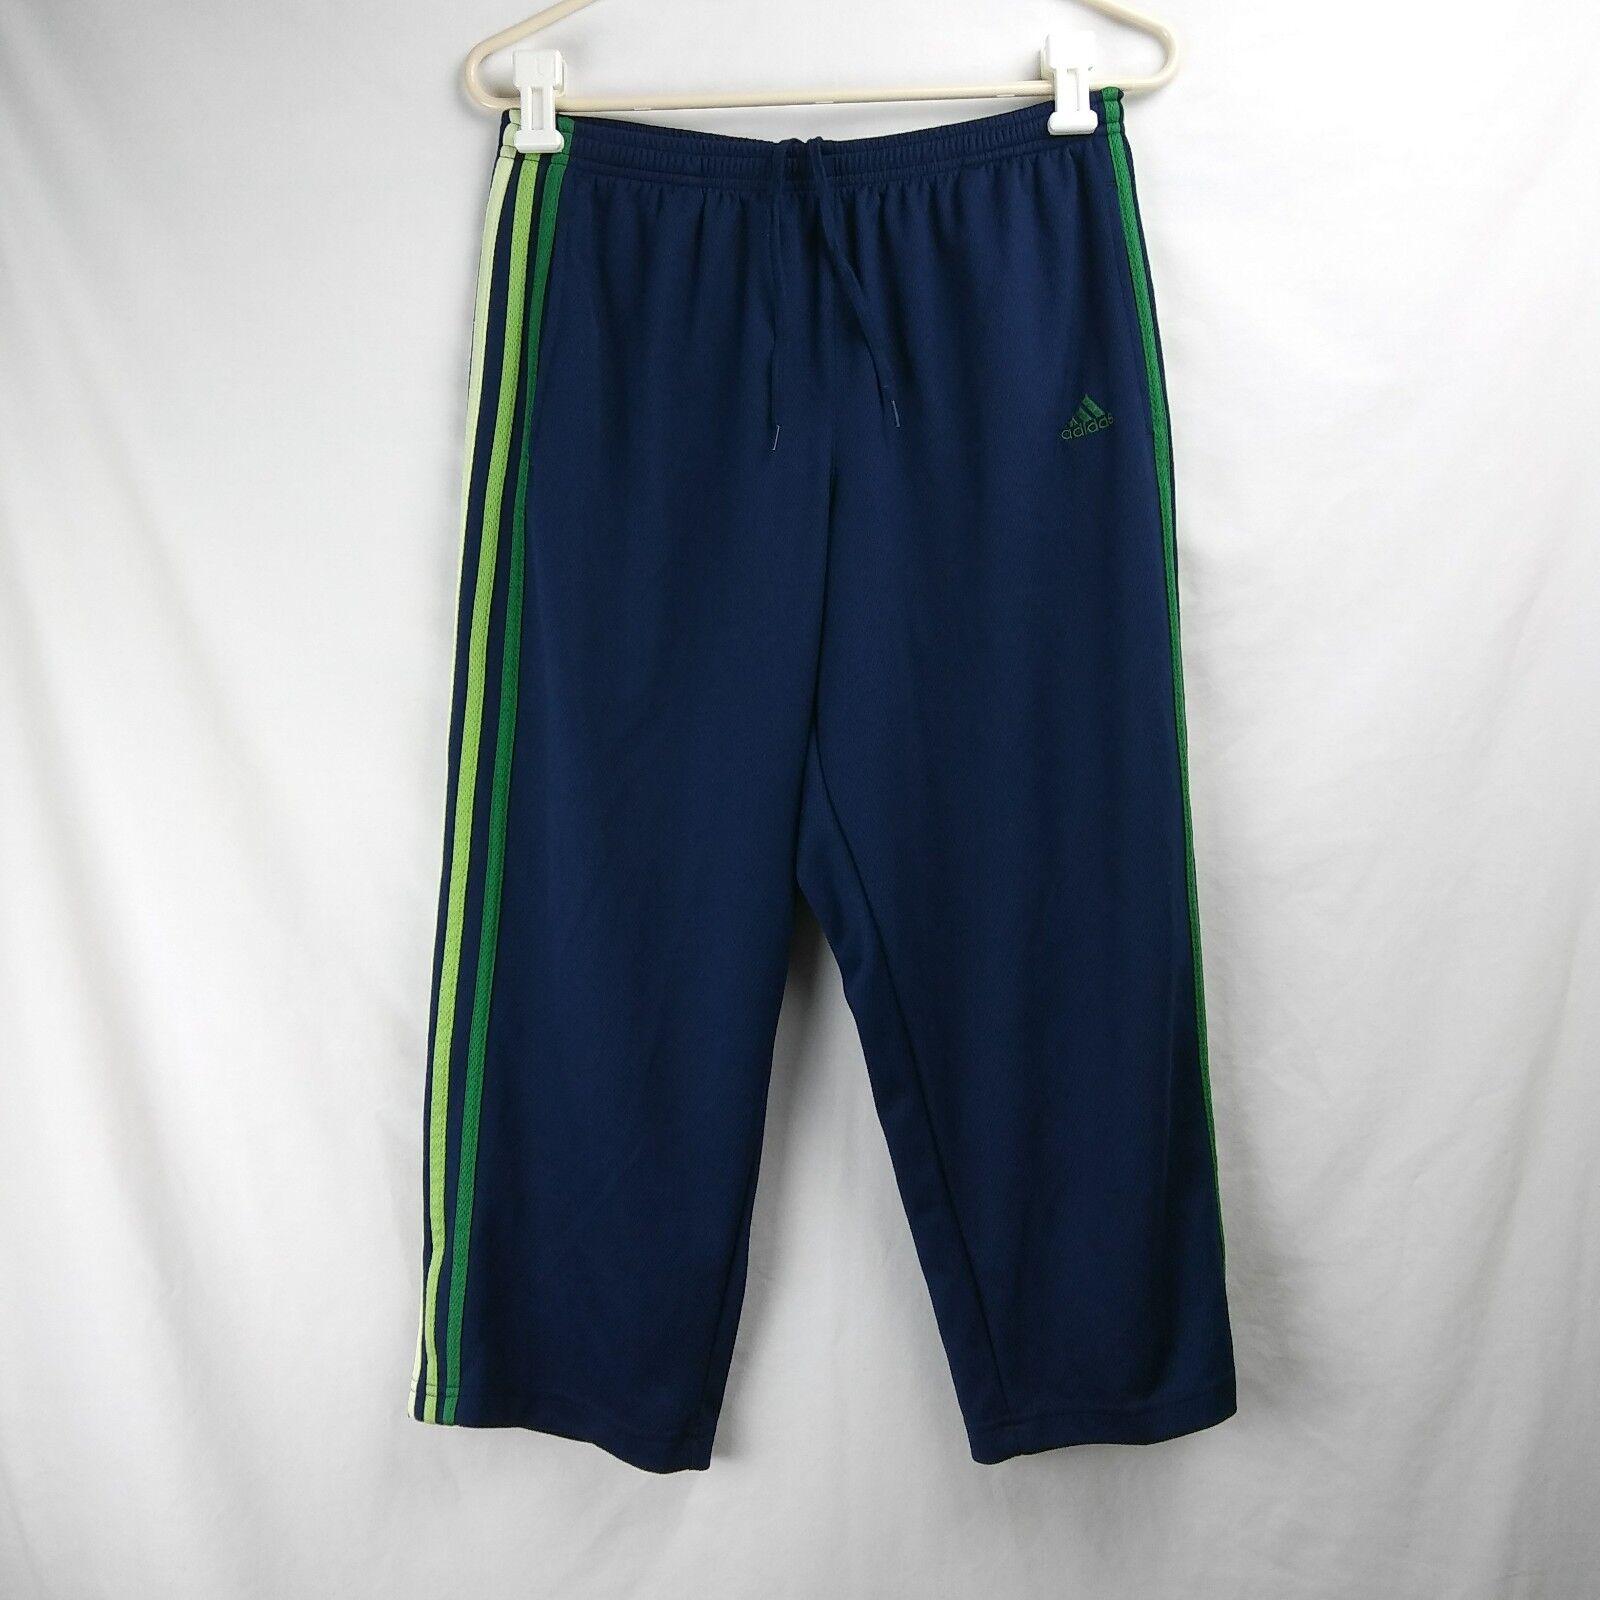 ADIDAS 2005 Αθλητικά Sweatpants Navy ΞœΟ€Ξ»Ξ΅ ΓυναικΡία ΞœΞΞ³Ξ΅ΞΈΞΏΟ' ΜΡγάλα